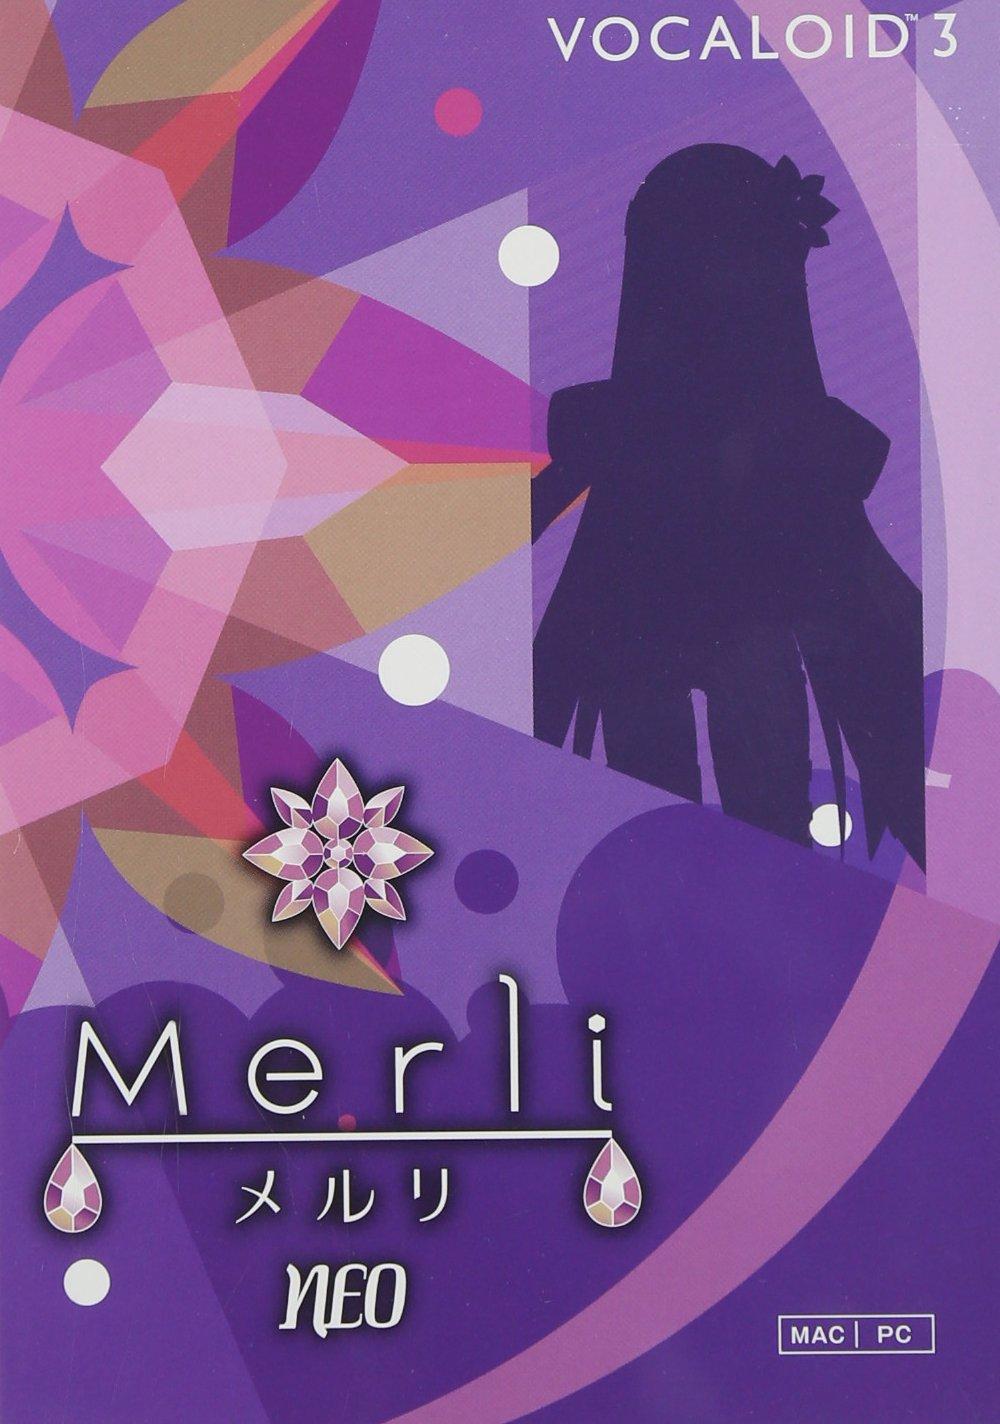 YAMAHA VOCALOIDTM3 Library Merli NEO (boxed version)